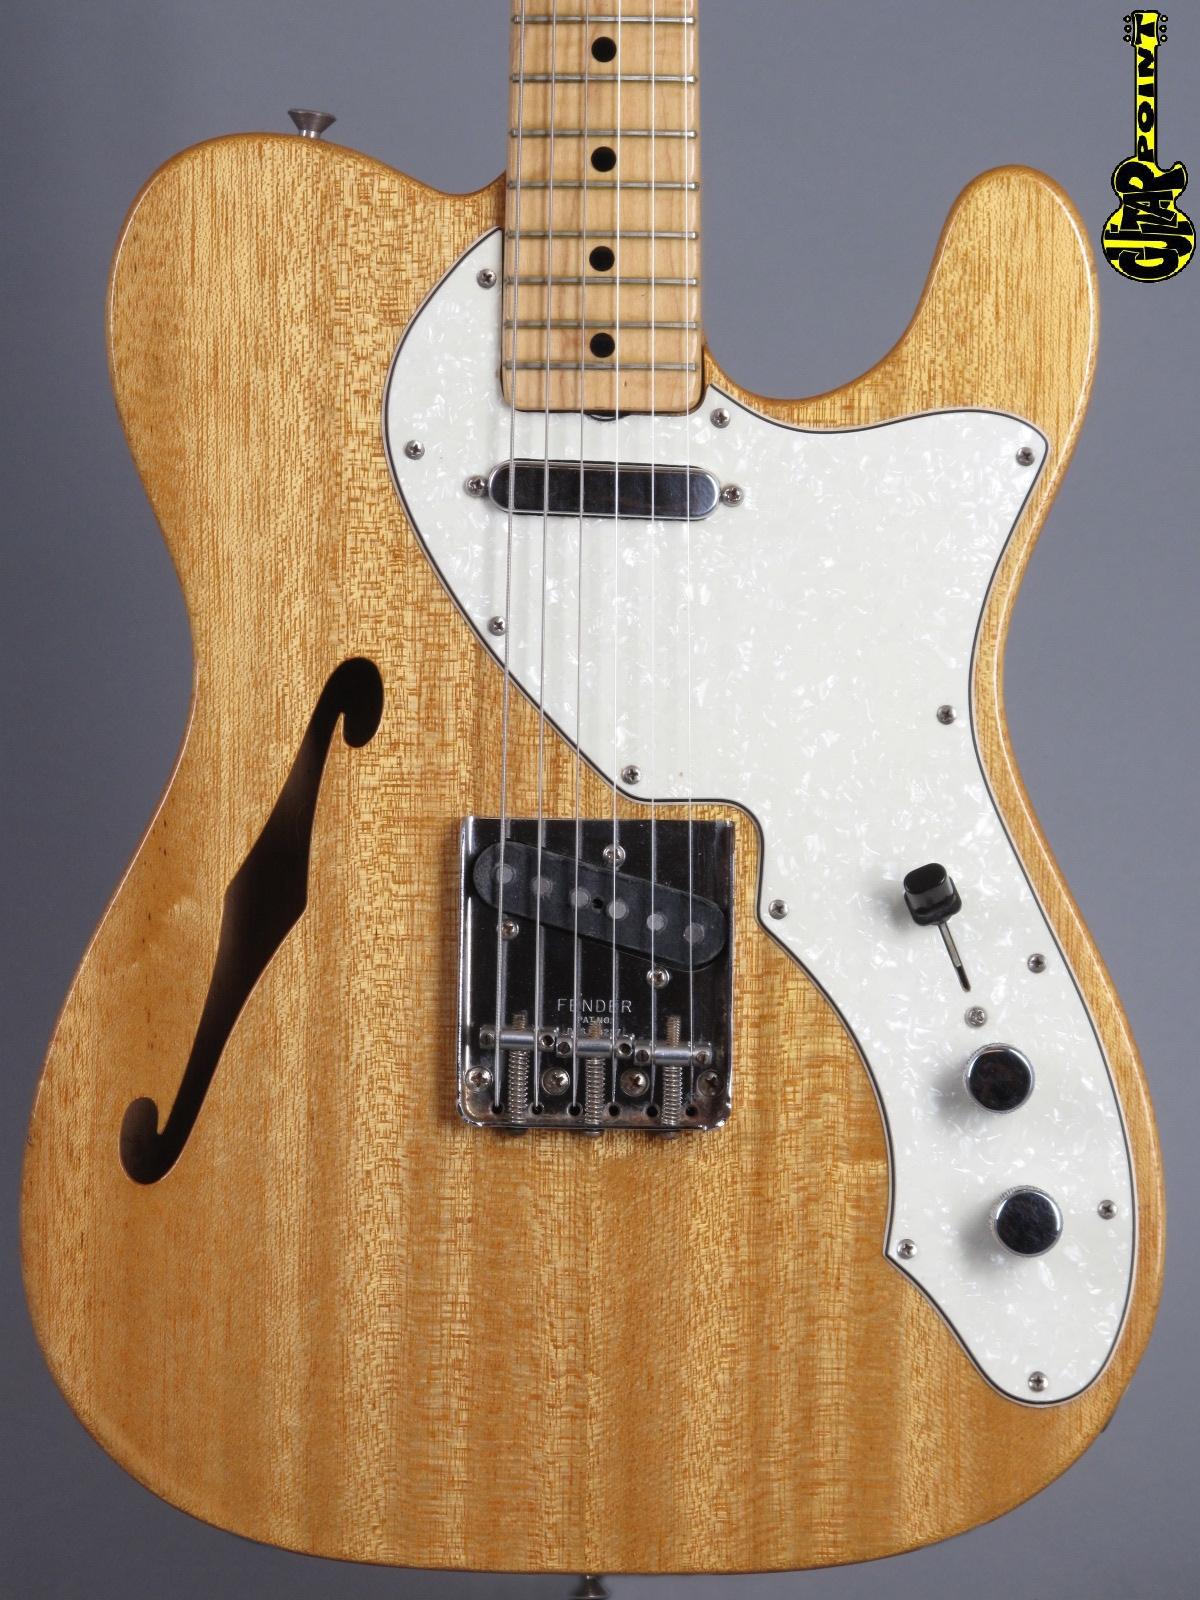 1969 Fender Thinline Telecaster - Mahogany ...2,75 Kg (!)